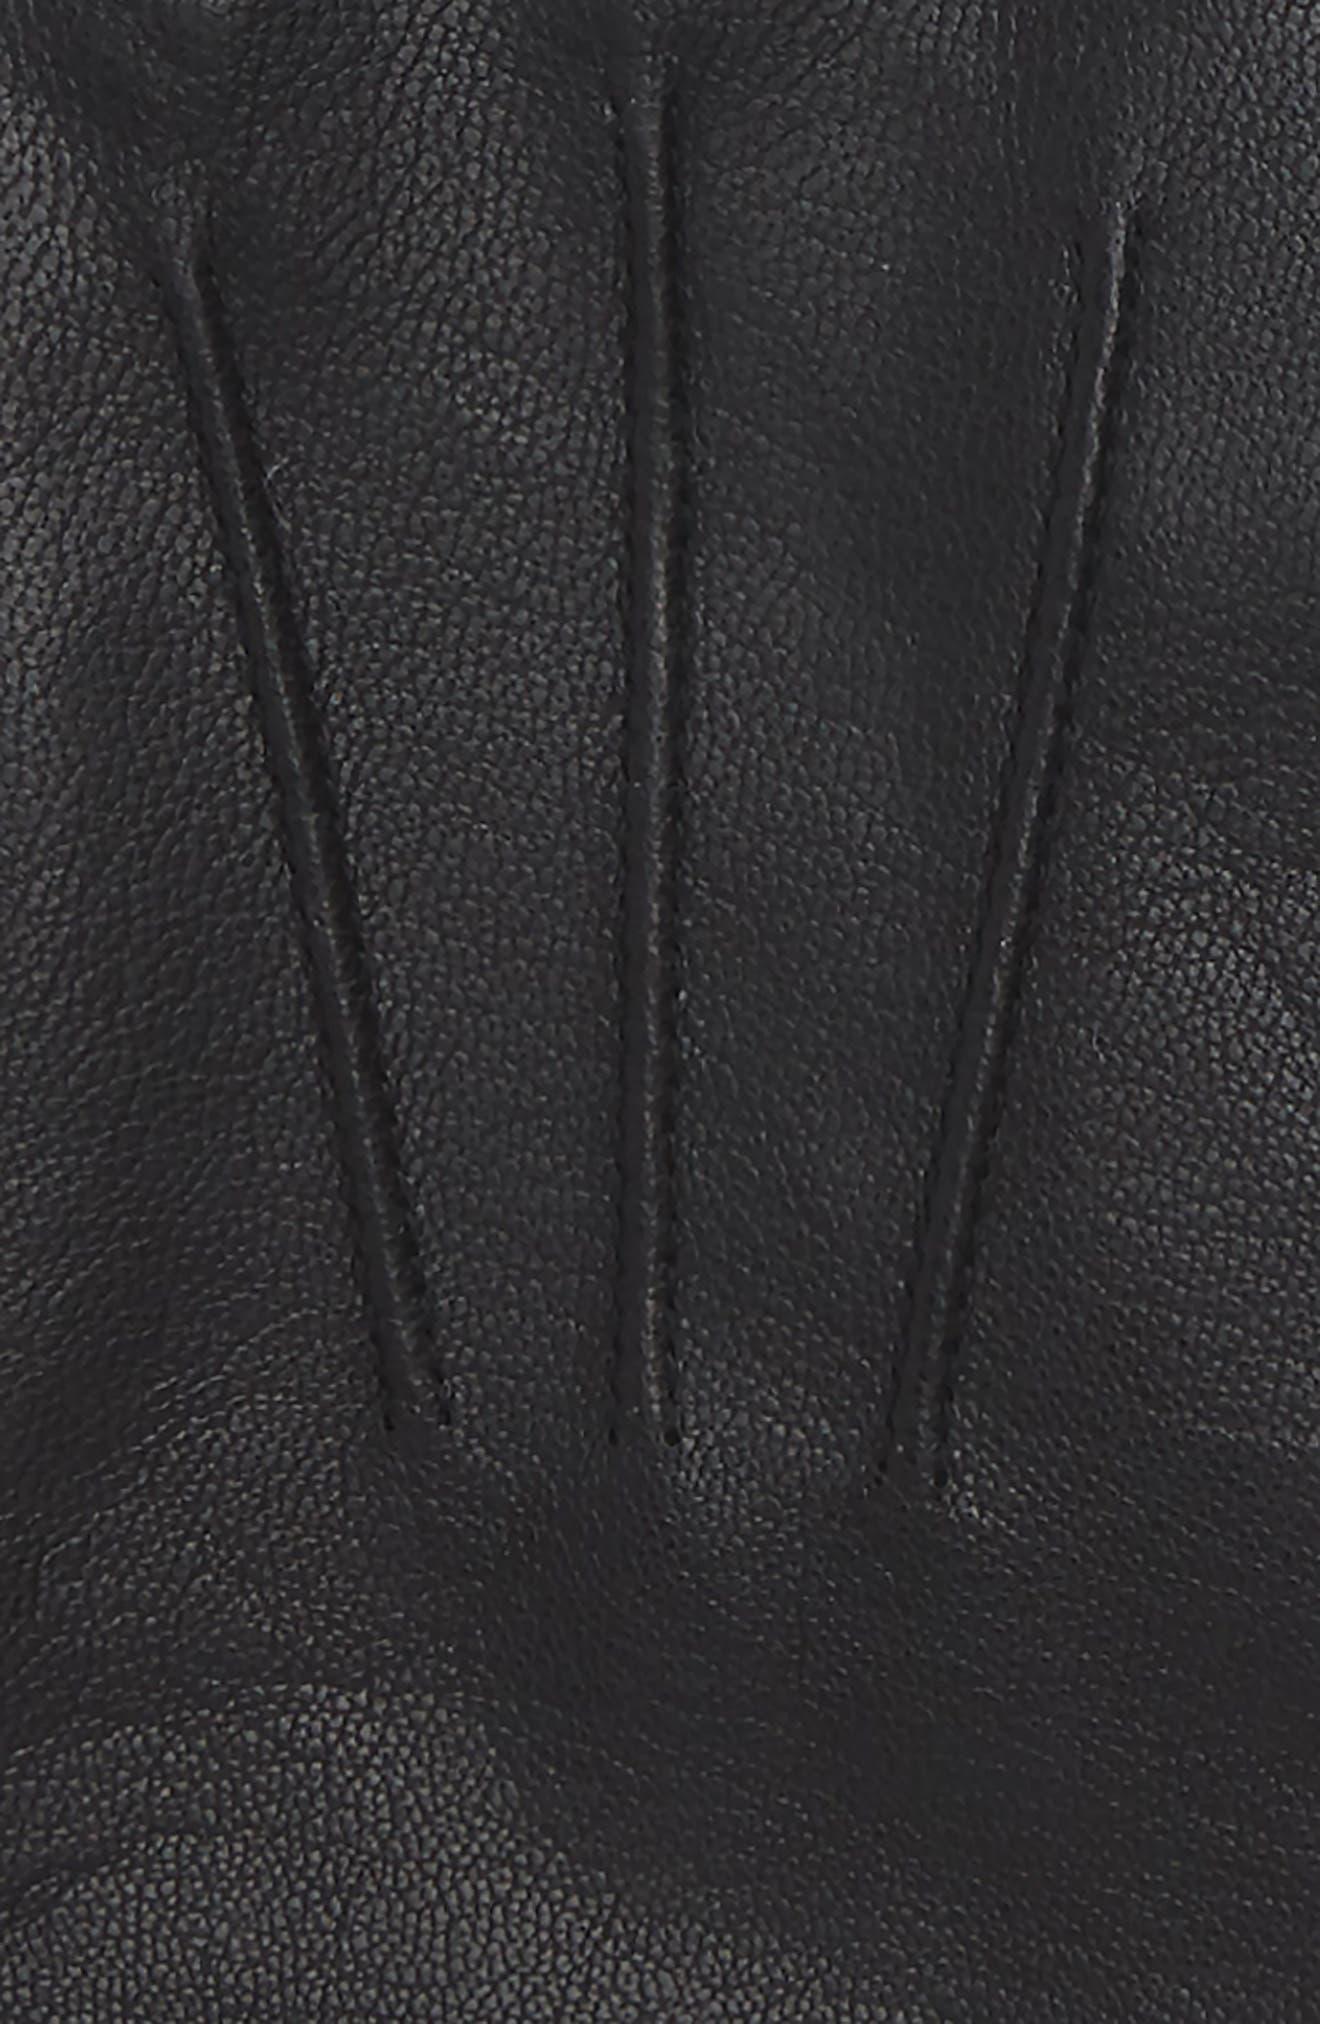 Alternate Image 2  - BOSS Hainz Leather Gloves